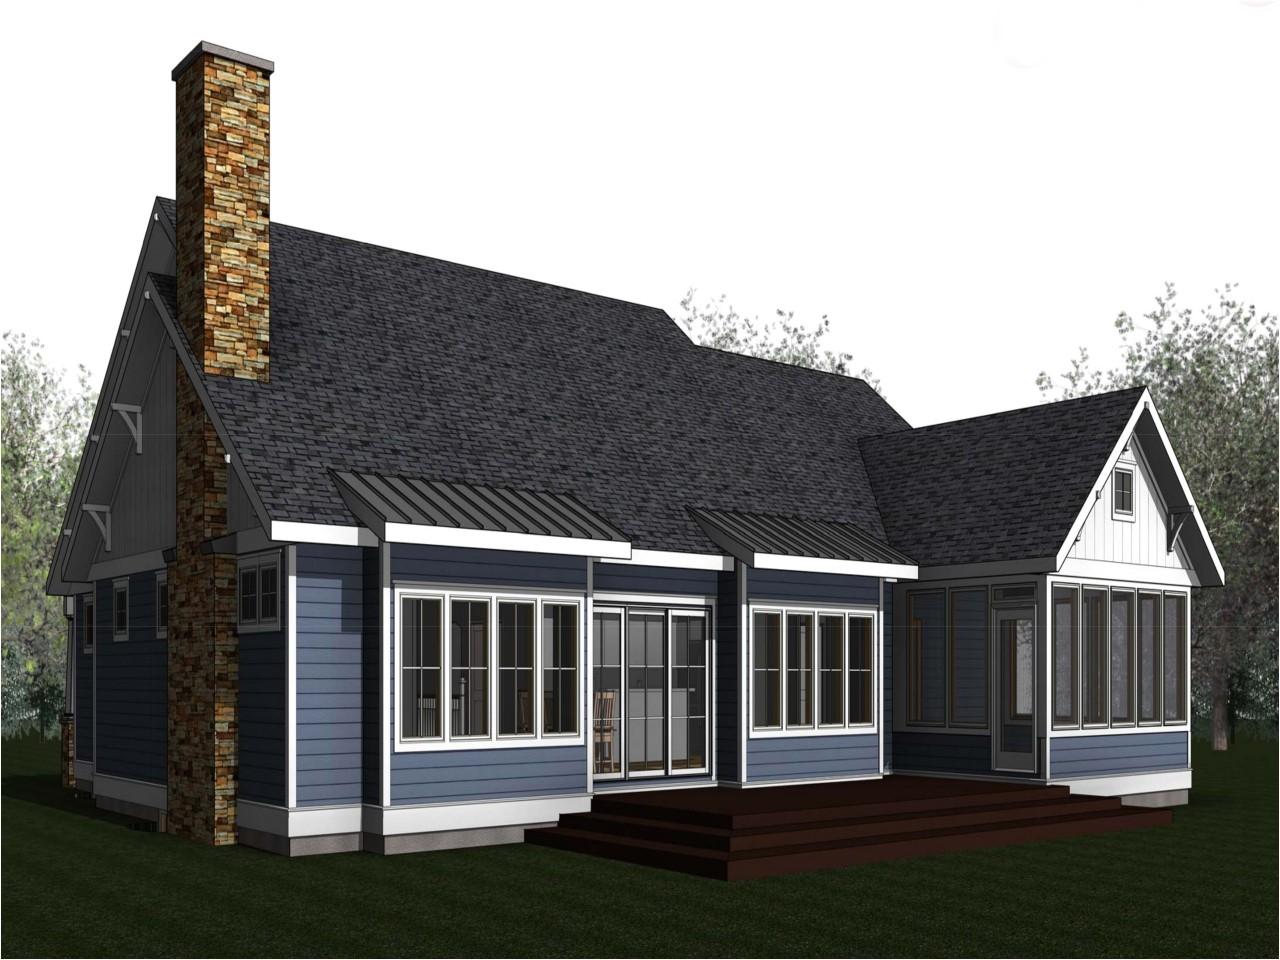 199f1a169f544cf0 award winning lake home plans award winning craftsman house plans